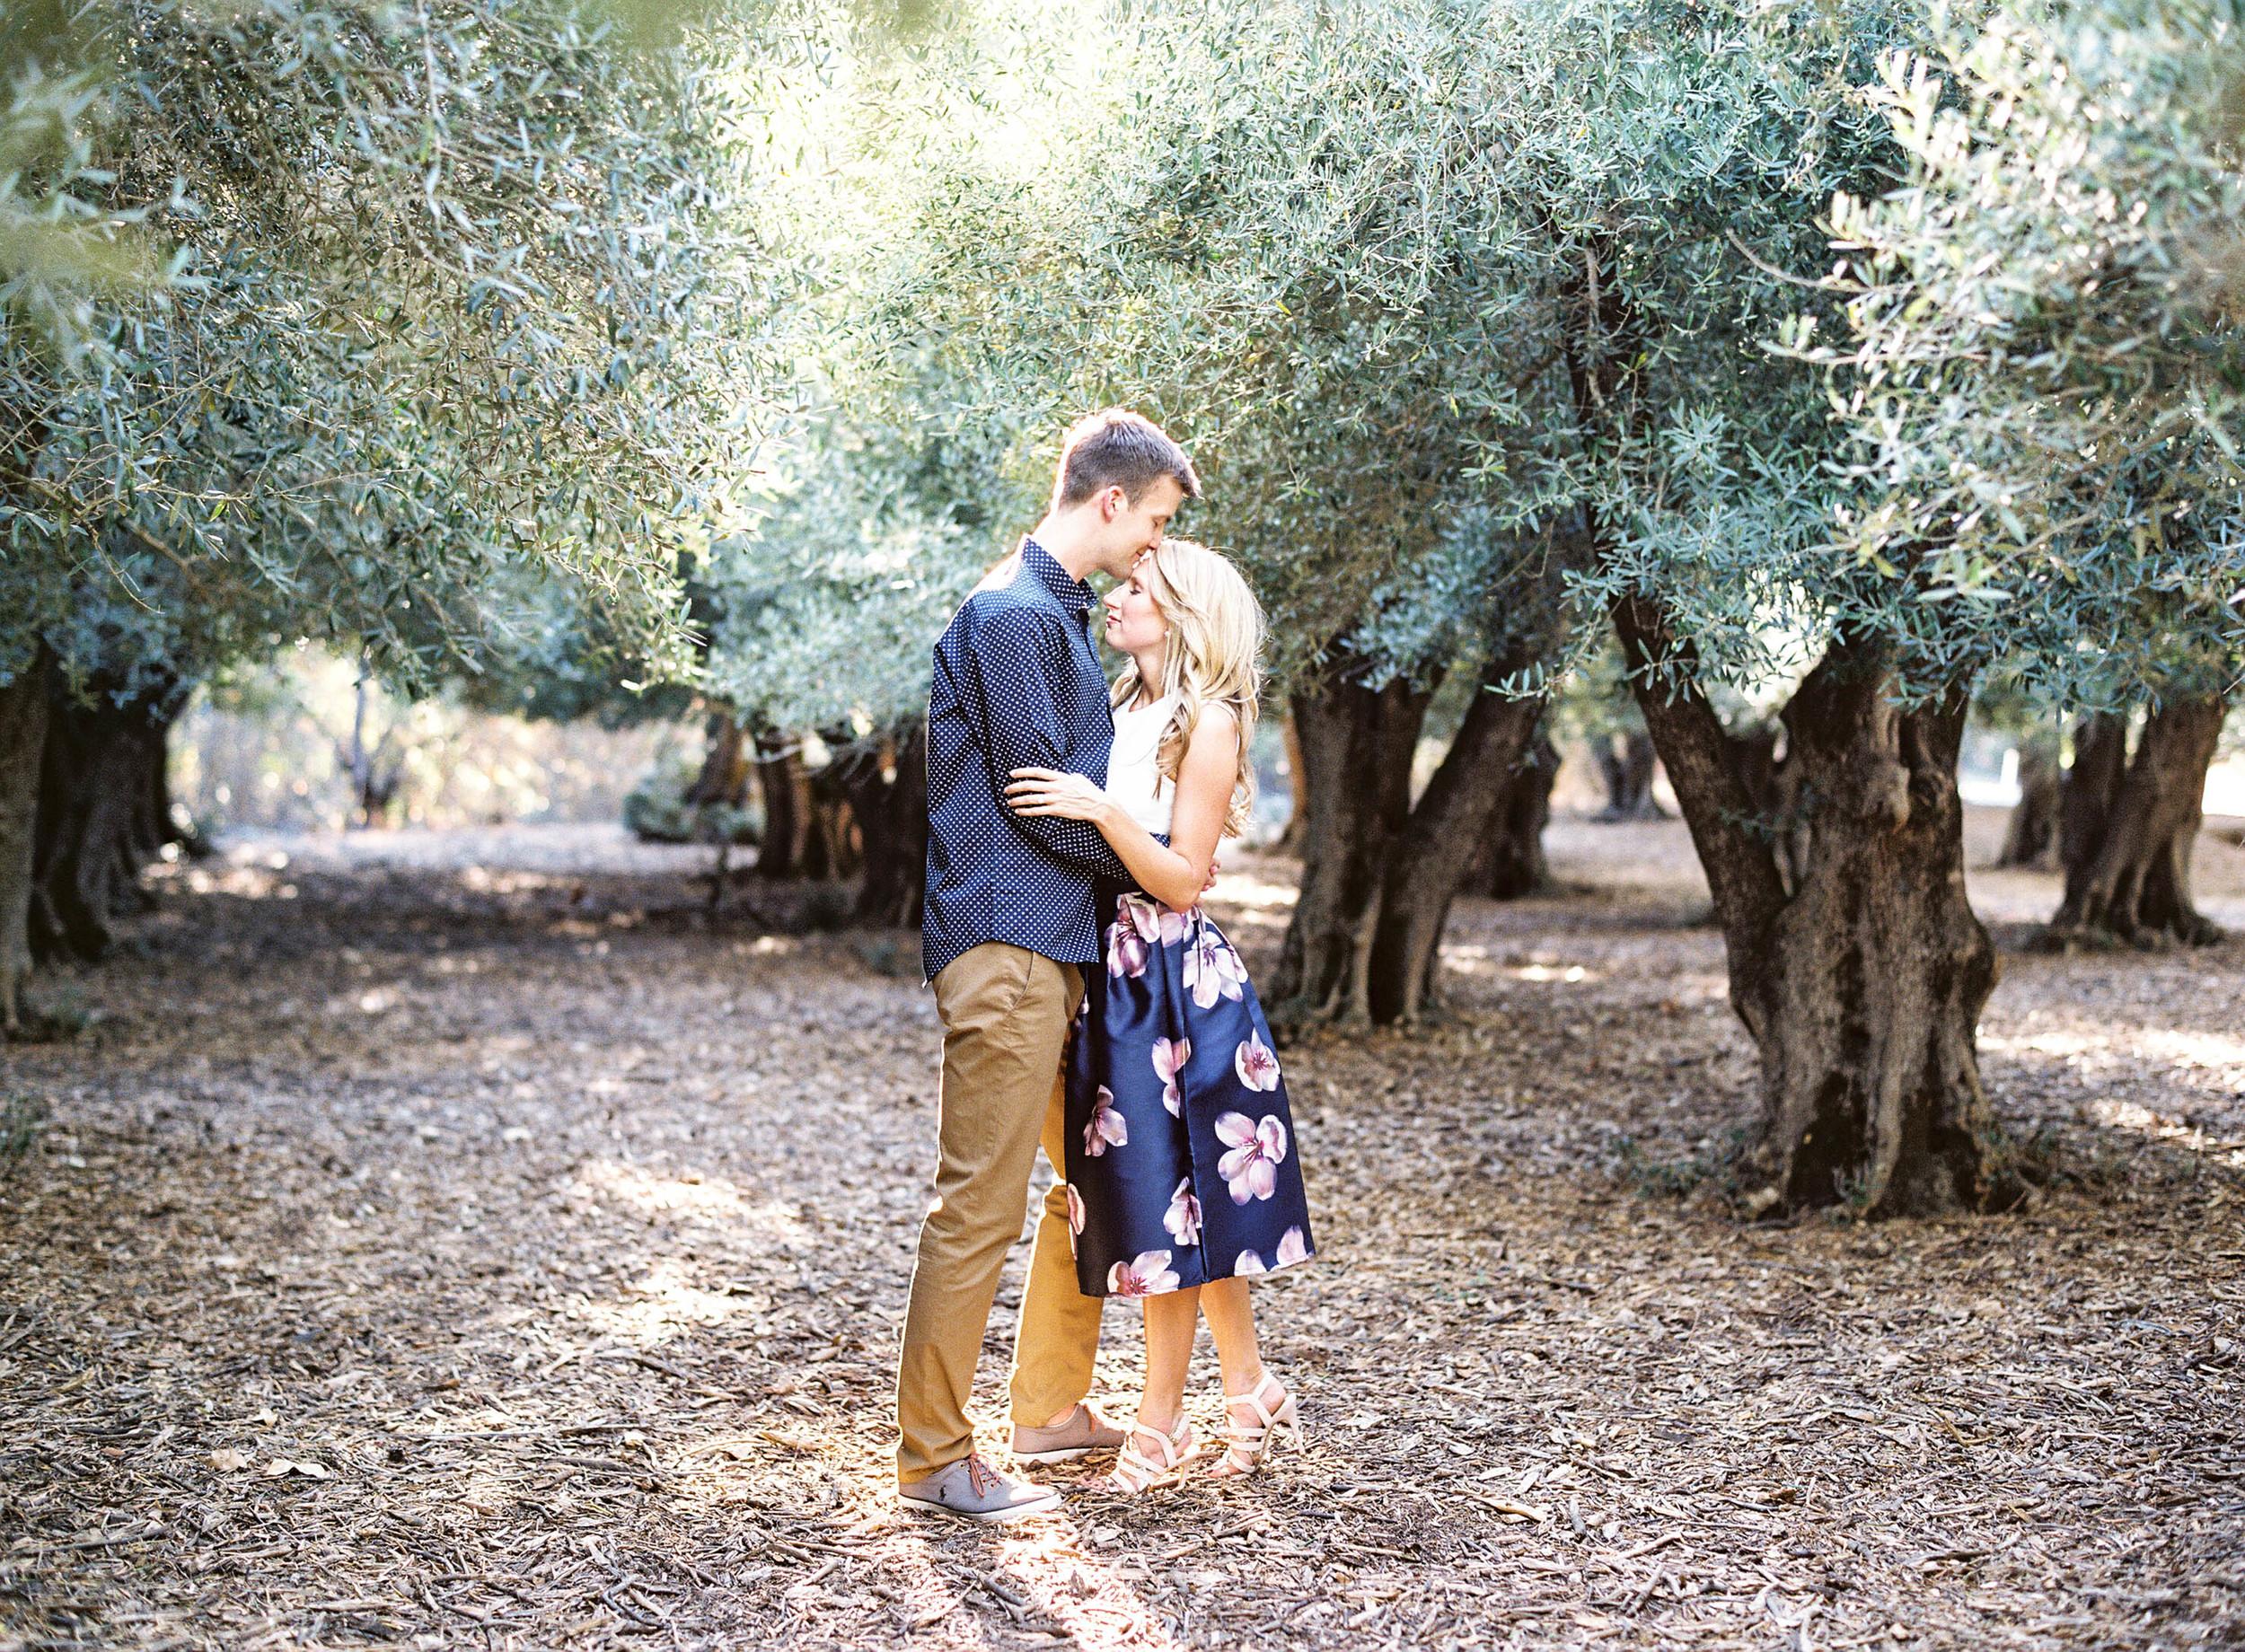 Meghan Mehan Photography - Fine Art Film Wedding Photography - San Francisco   Napa   Sonoma   Big Sur   Chicago   Minneapolis   Milwaukee   Lake Geneva   Door County   Wisconsin 015.jpg